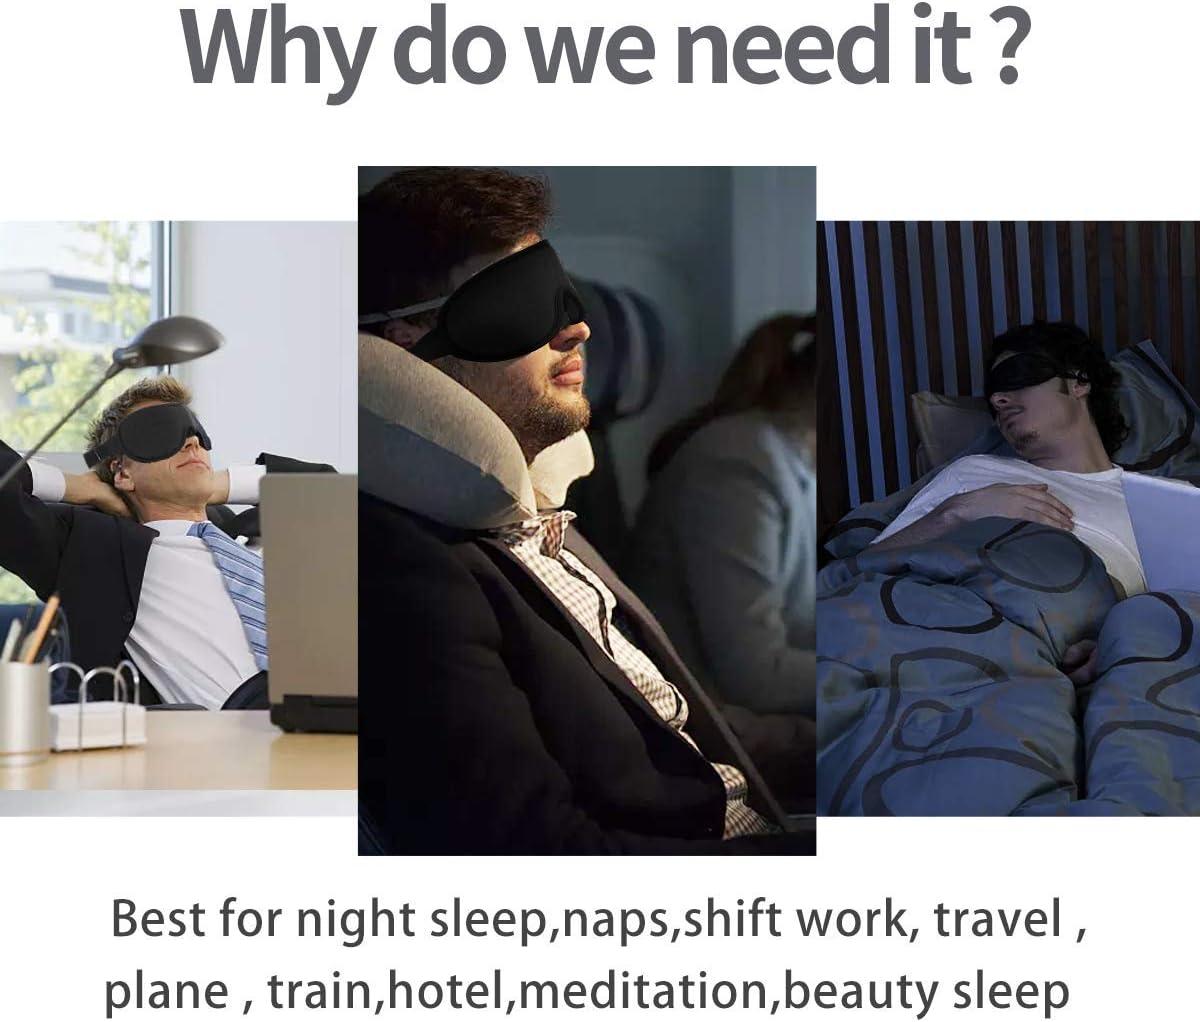 Eye Mask for Sleeping,Sleep Mask for Women /& Men,Sleeping Mask,Silk Eye mask,Block Out Light 100/% Eye Shade Cover,Travel//Naps//Yoga//Plane//Night,Black